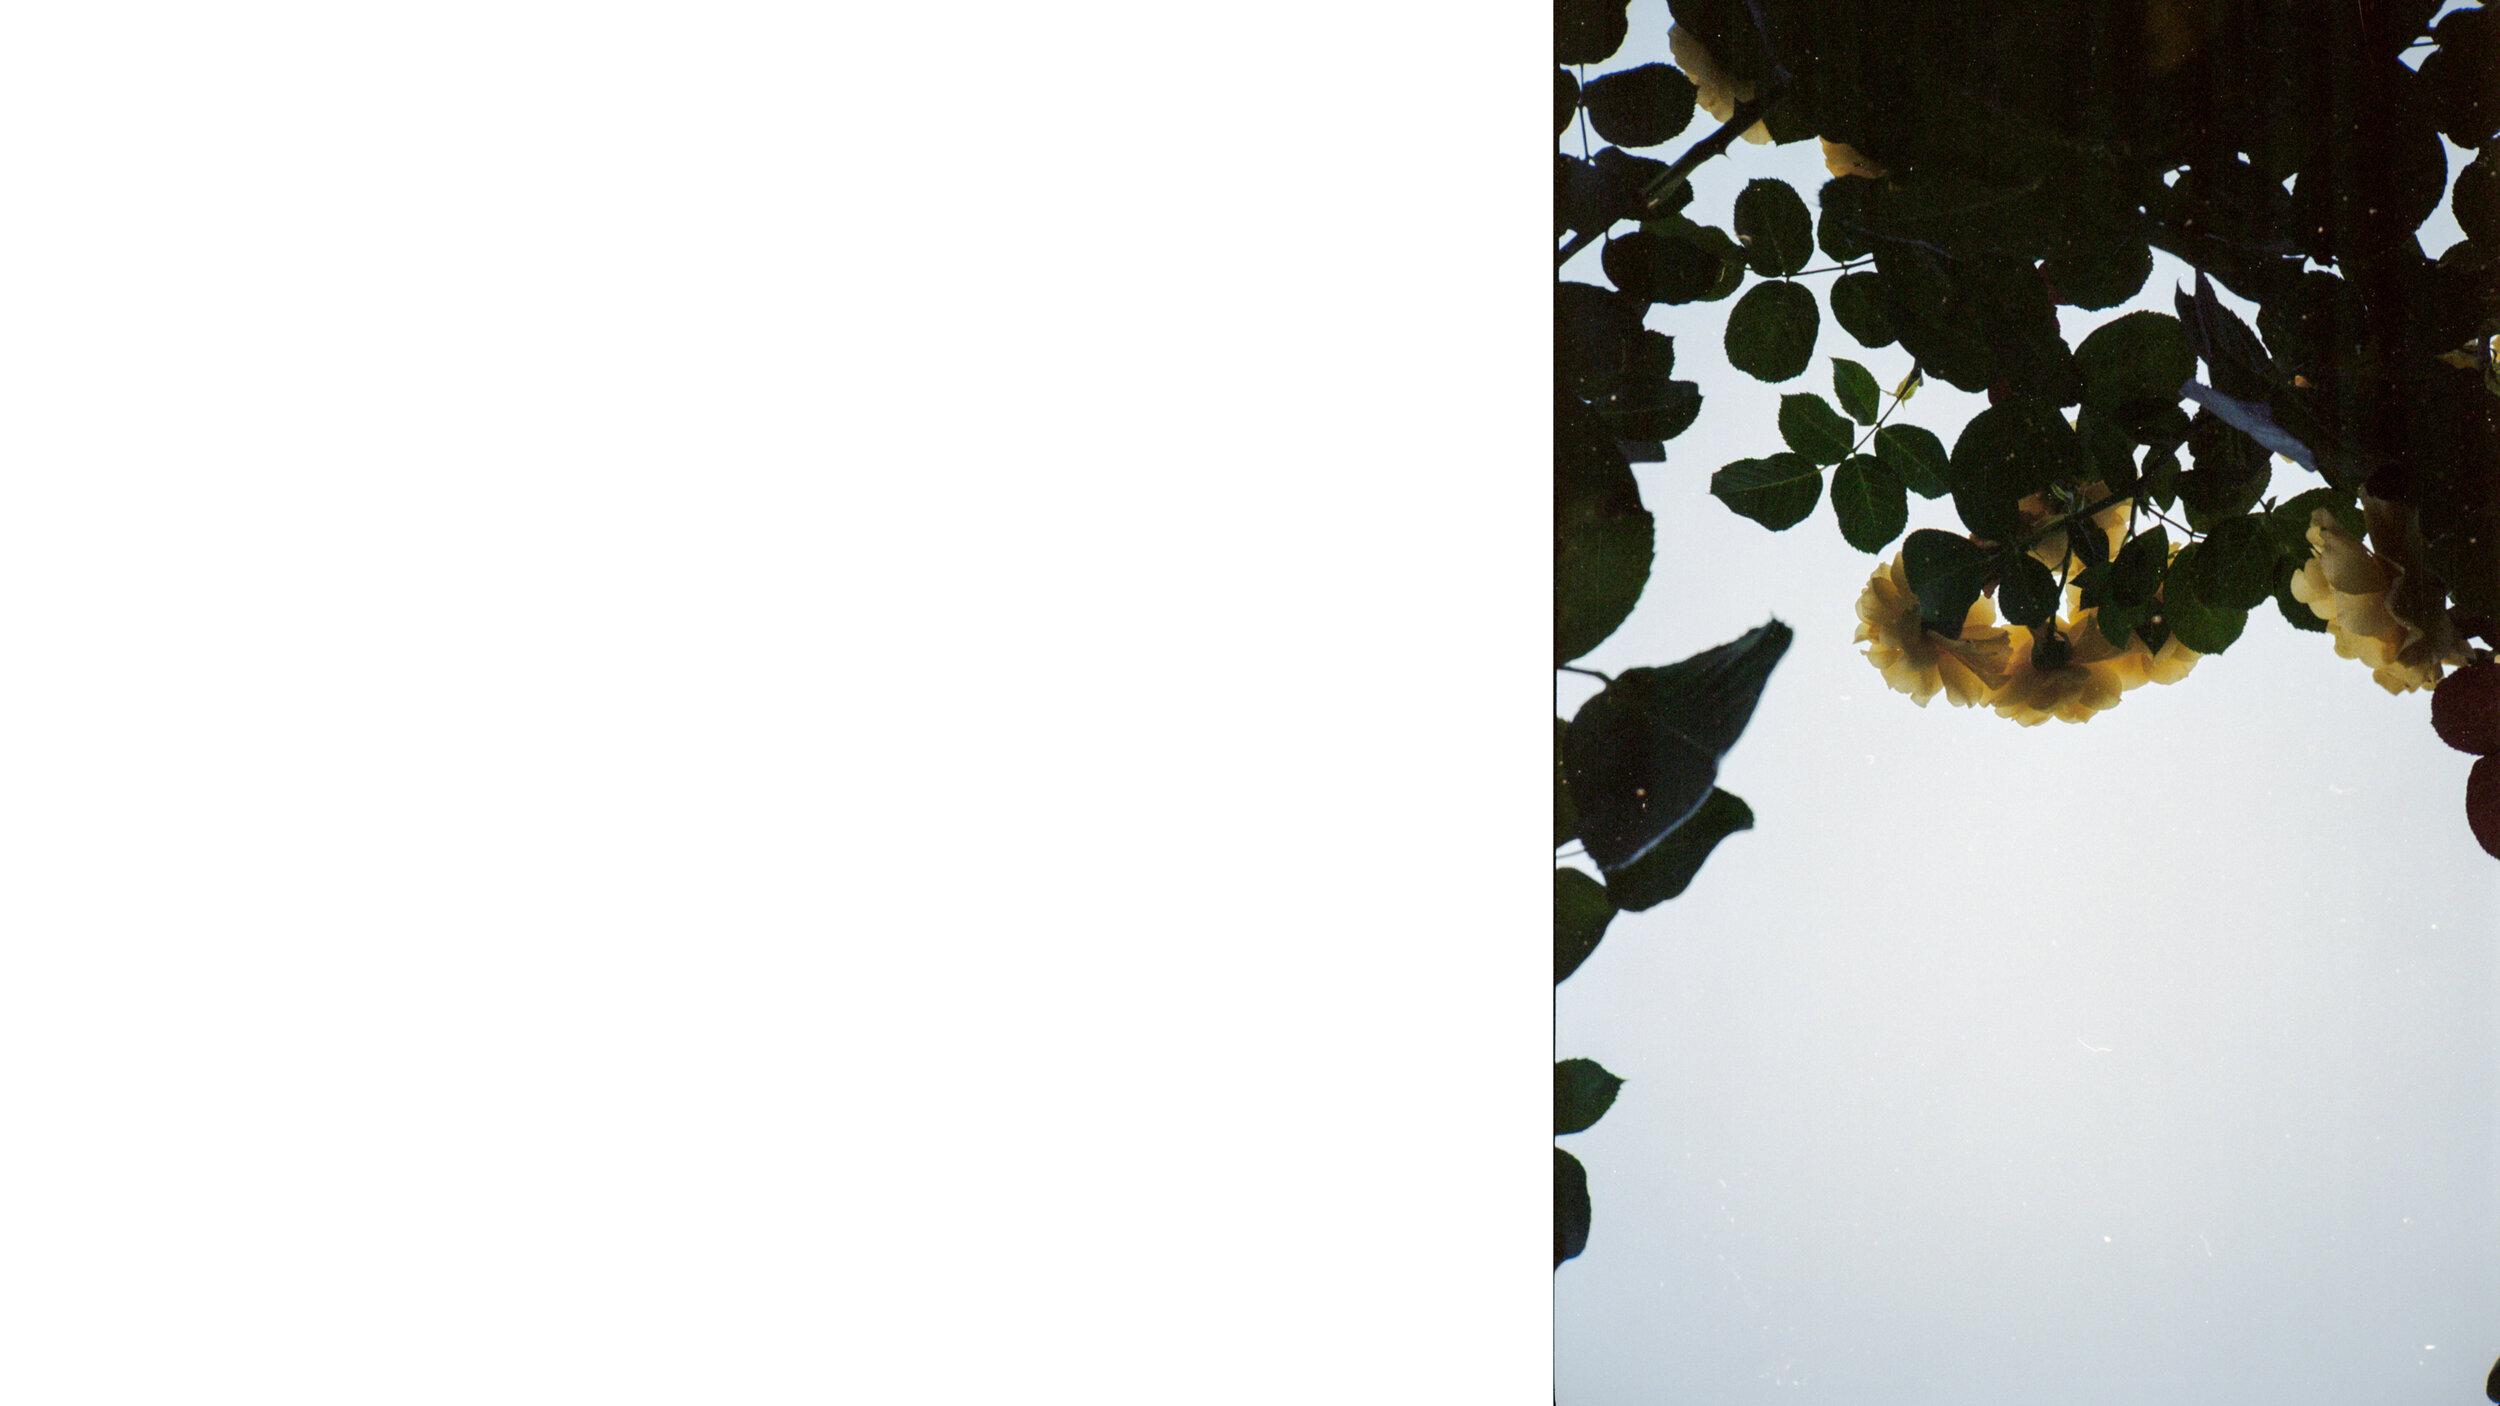 pics-2-6.jpg